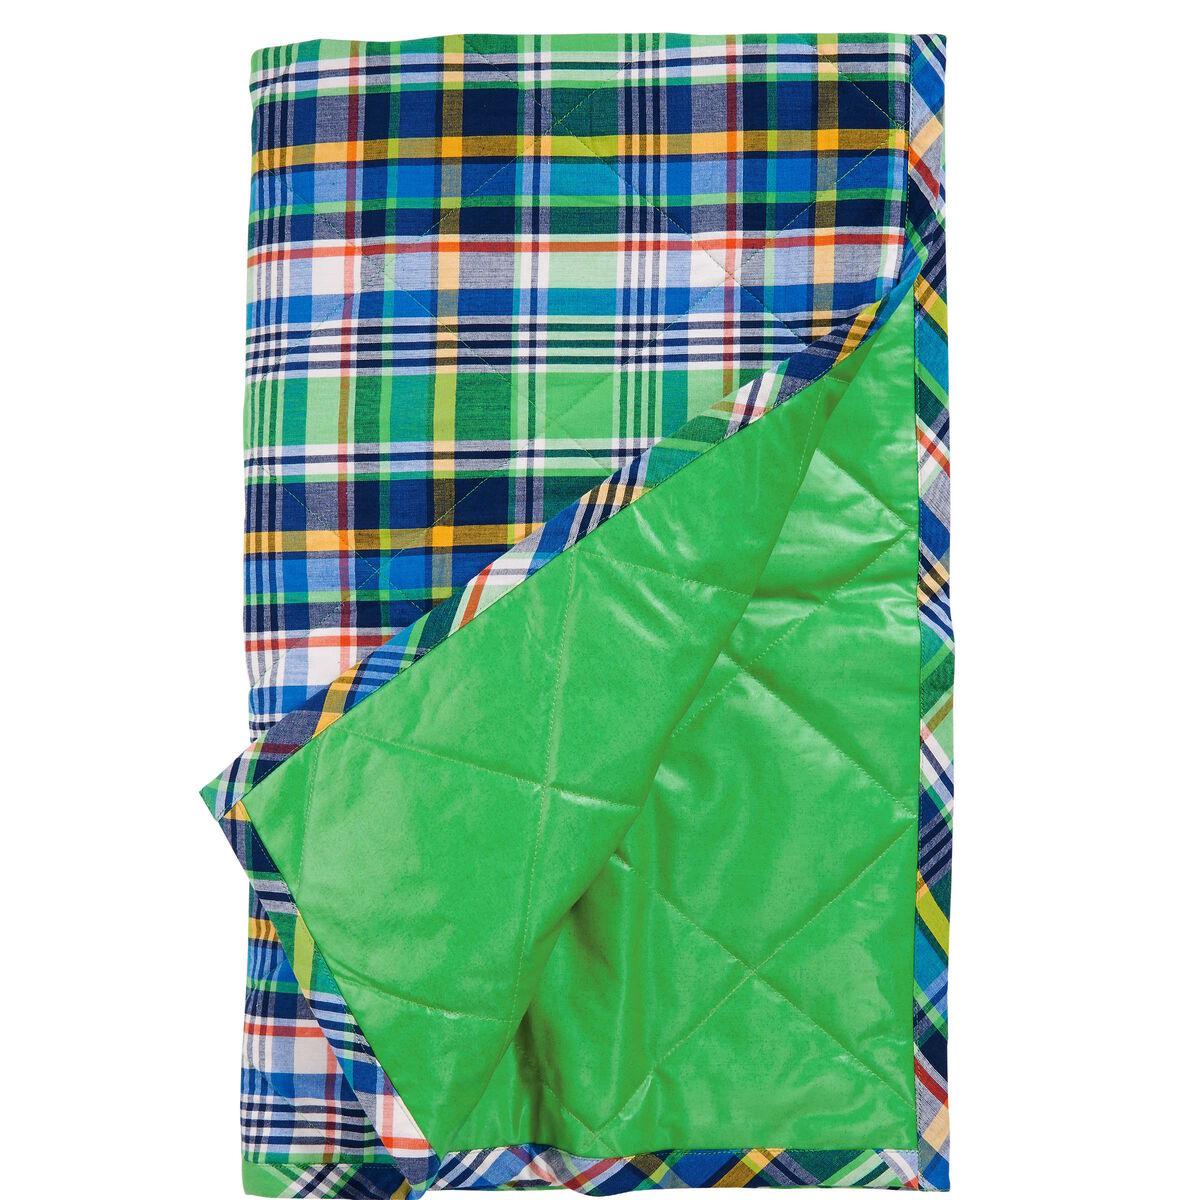 Woodpacker picknickdecke karo butlers - Butlers decke ...